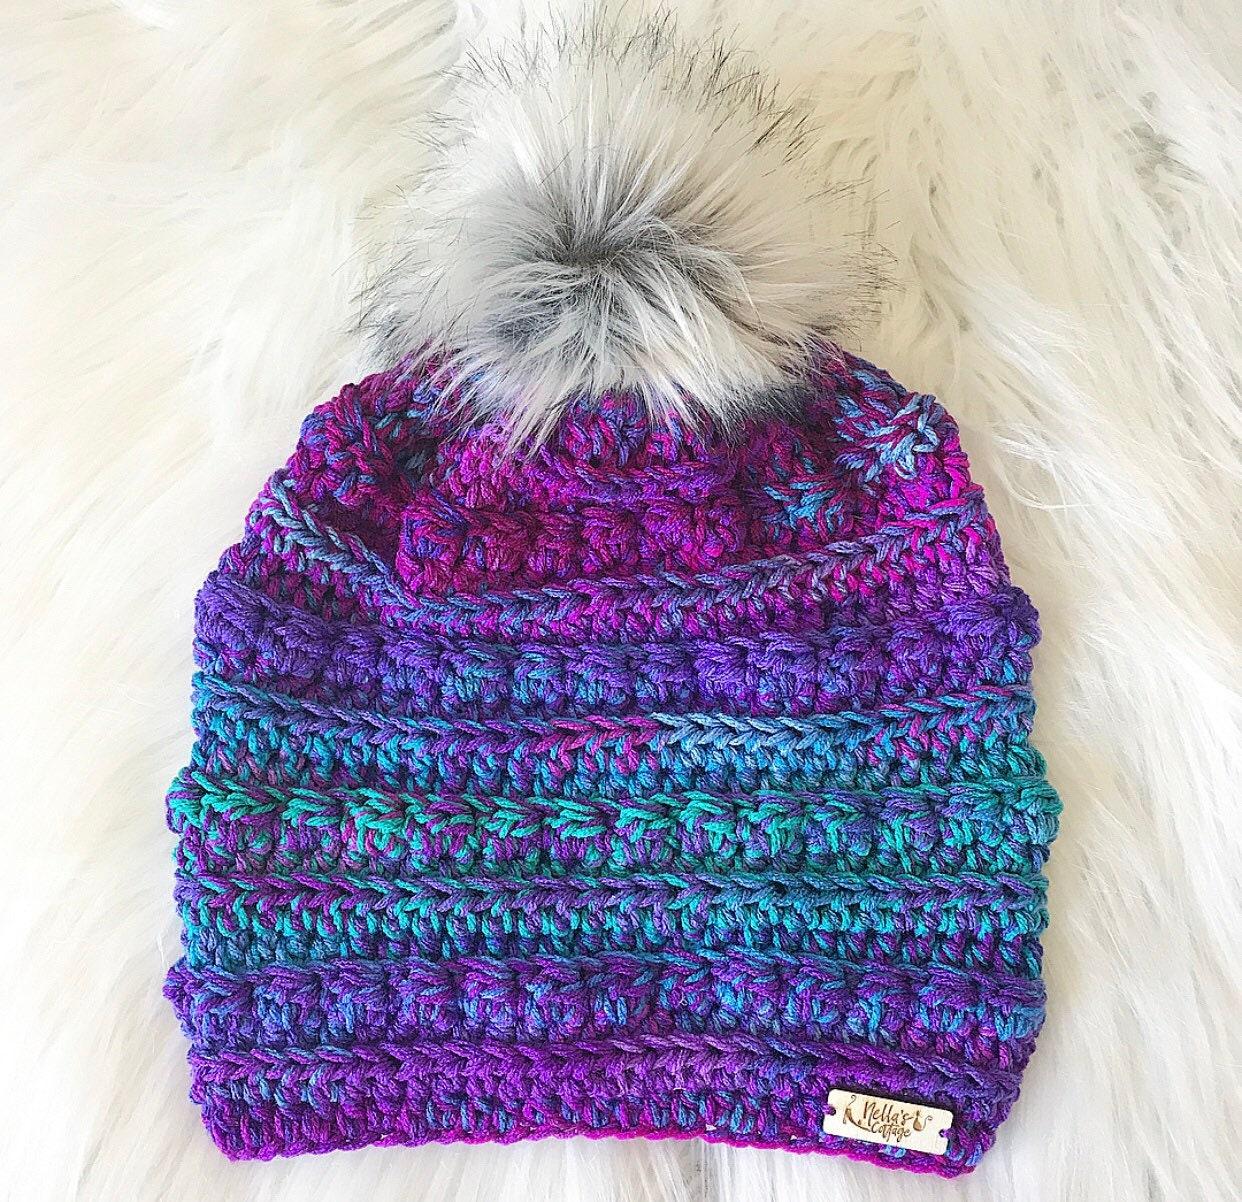 f764f9a53e9 Mermaid Beanie - Hat - Beanie - Winter Hat - Knit Hat - Knit Beanie -  Crocheted Hat - Gifts - Chunky Knit Hat - Faux Fur Beanie - Fall